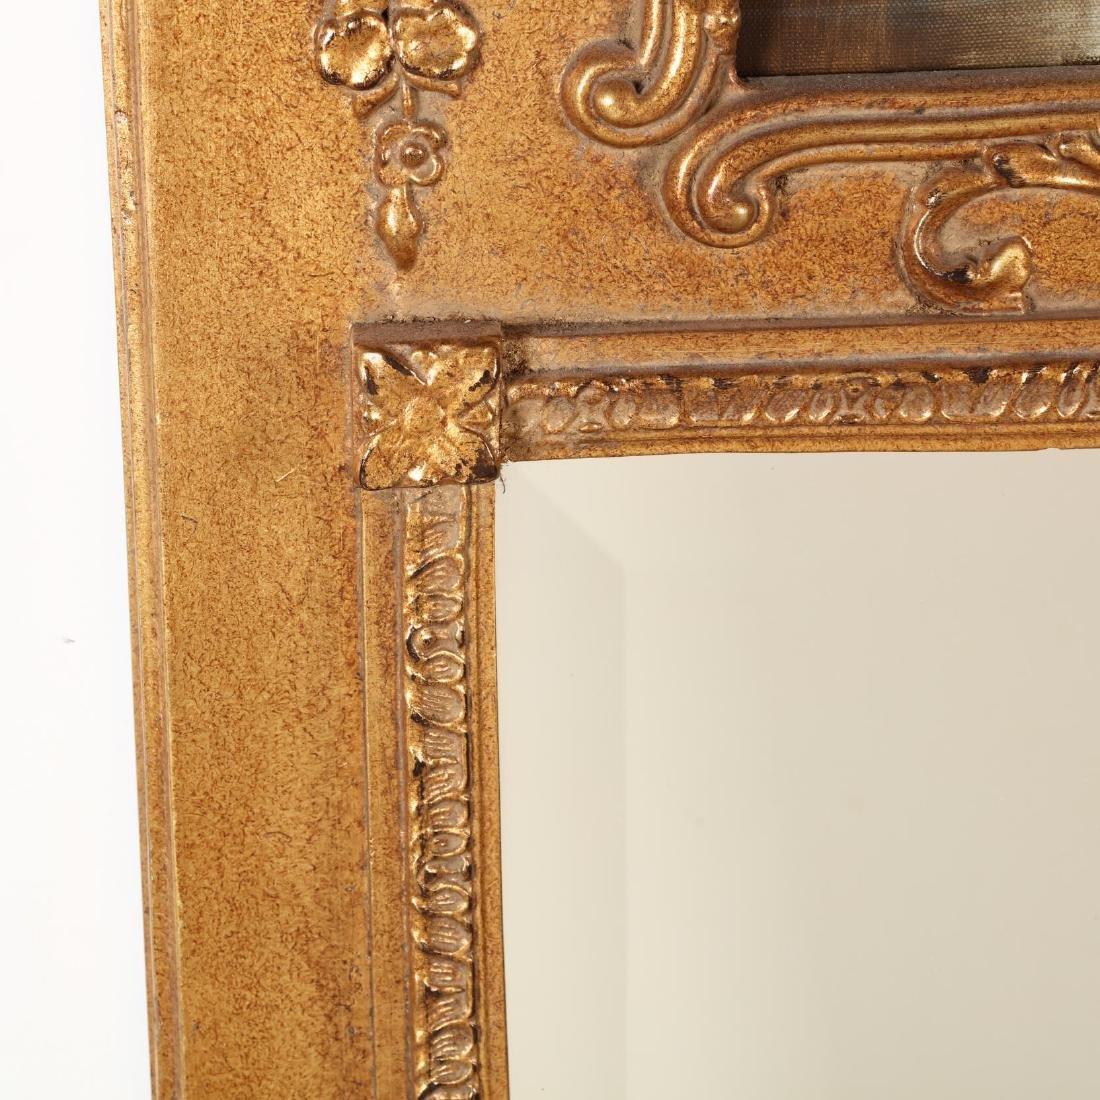 A Contemporary Decorative Trumeau - 3